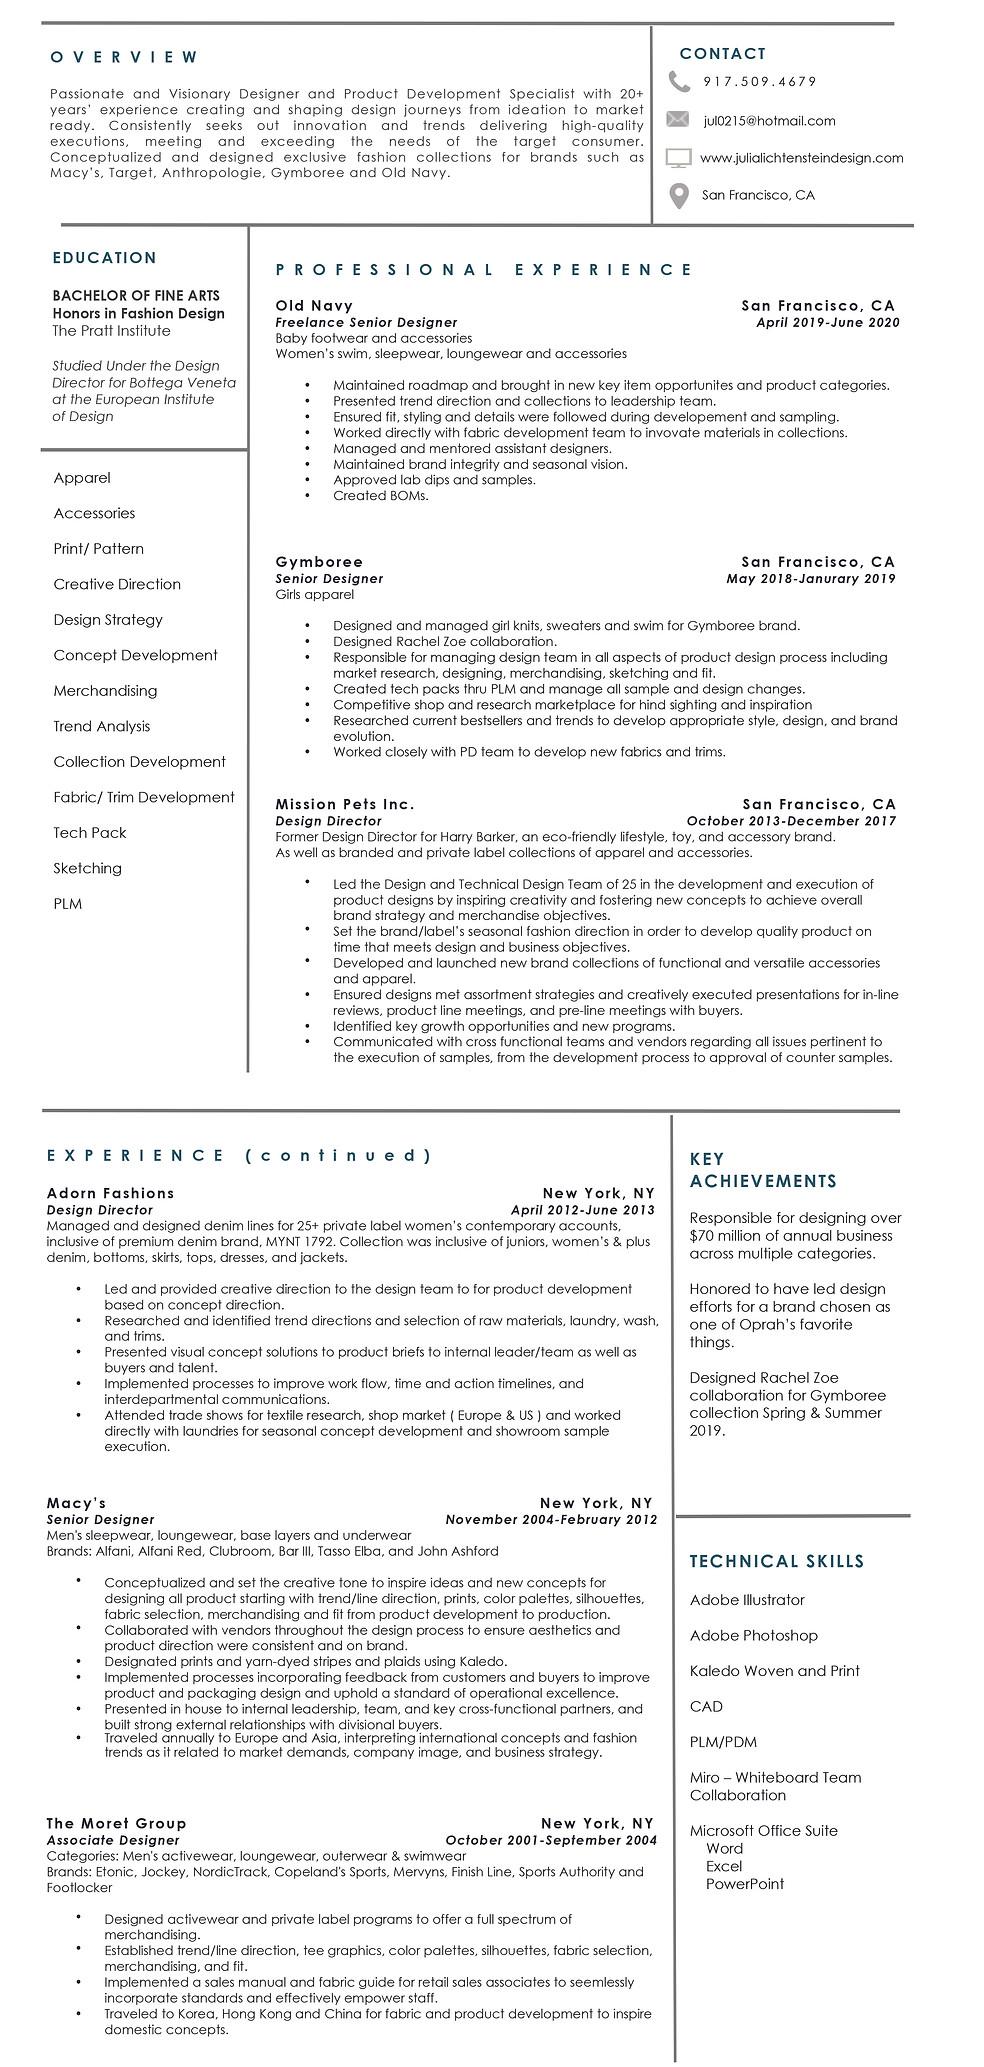 Resume 1-21-01.jpg